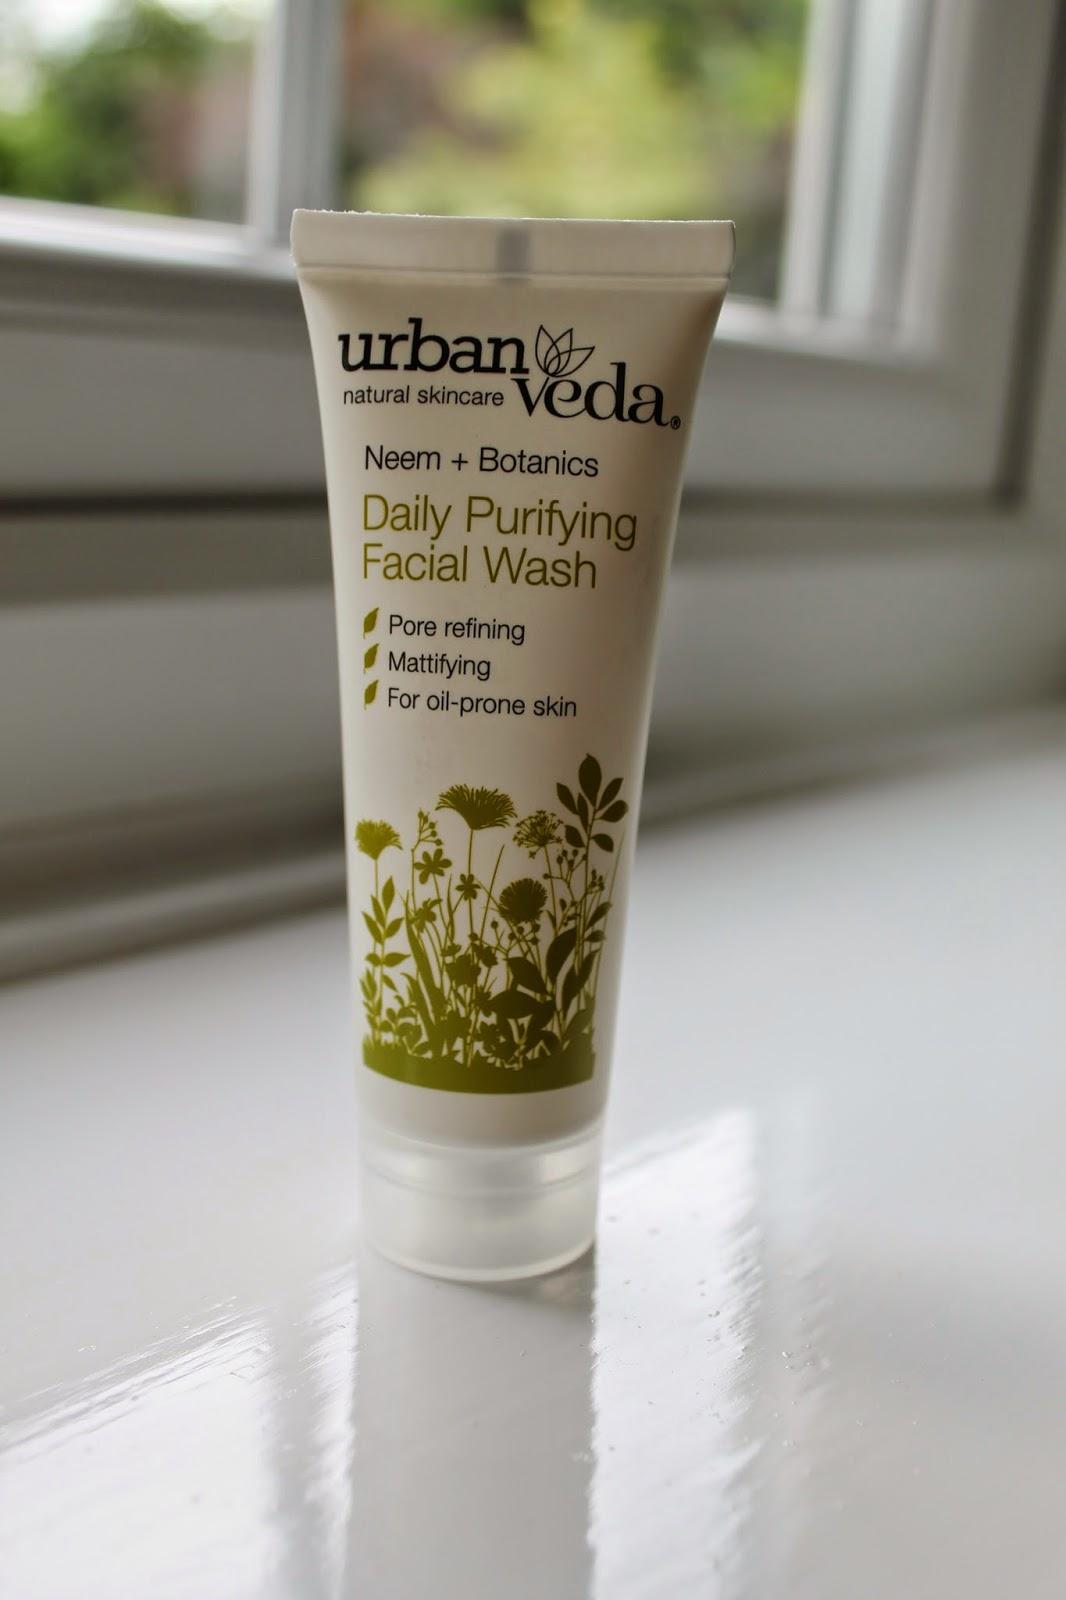 Love Me Beauty Box June 2014 Urban Veda Purifying Daily Facial Wash